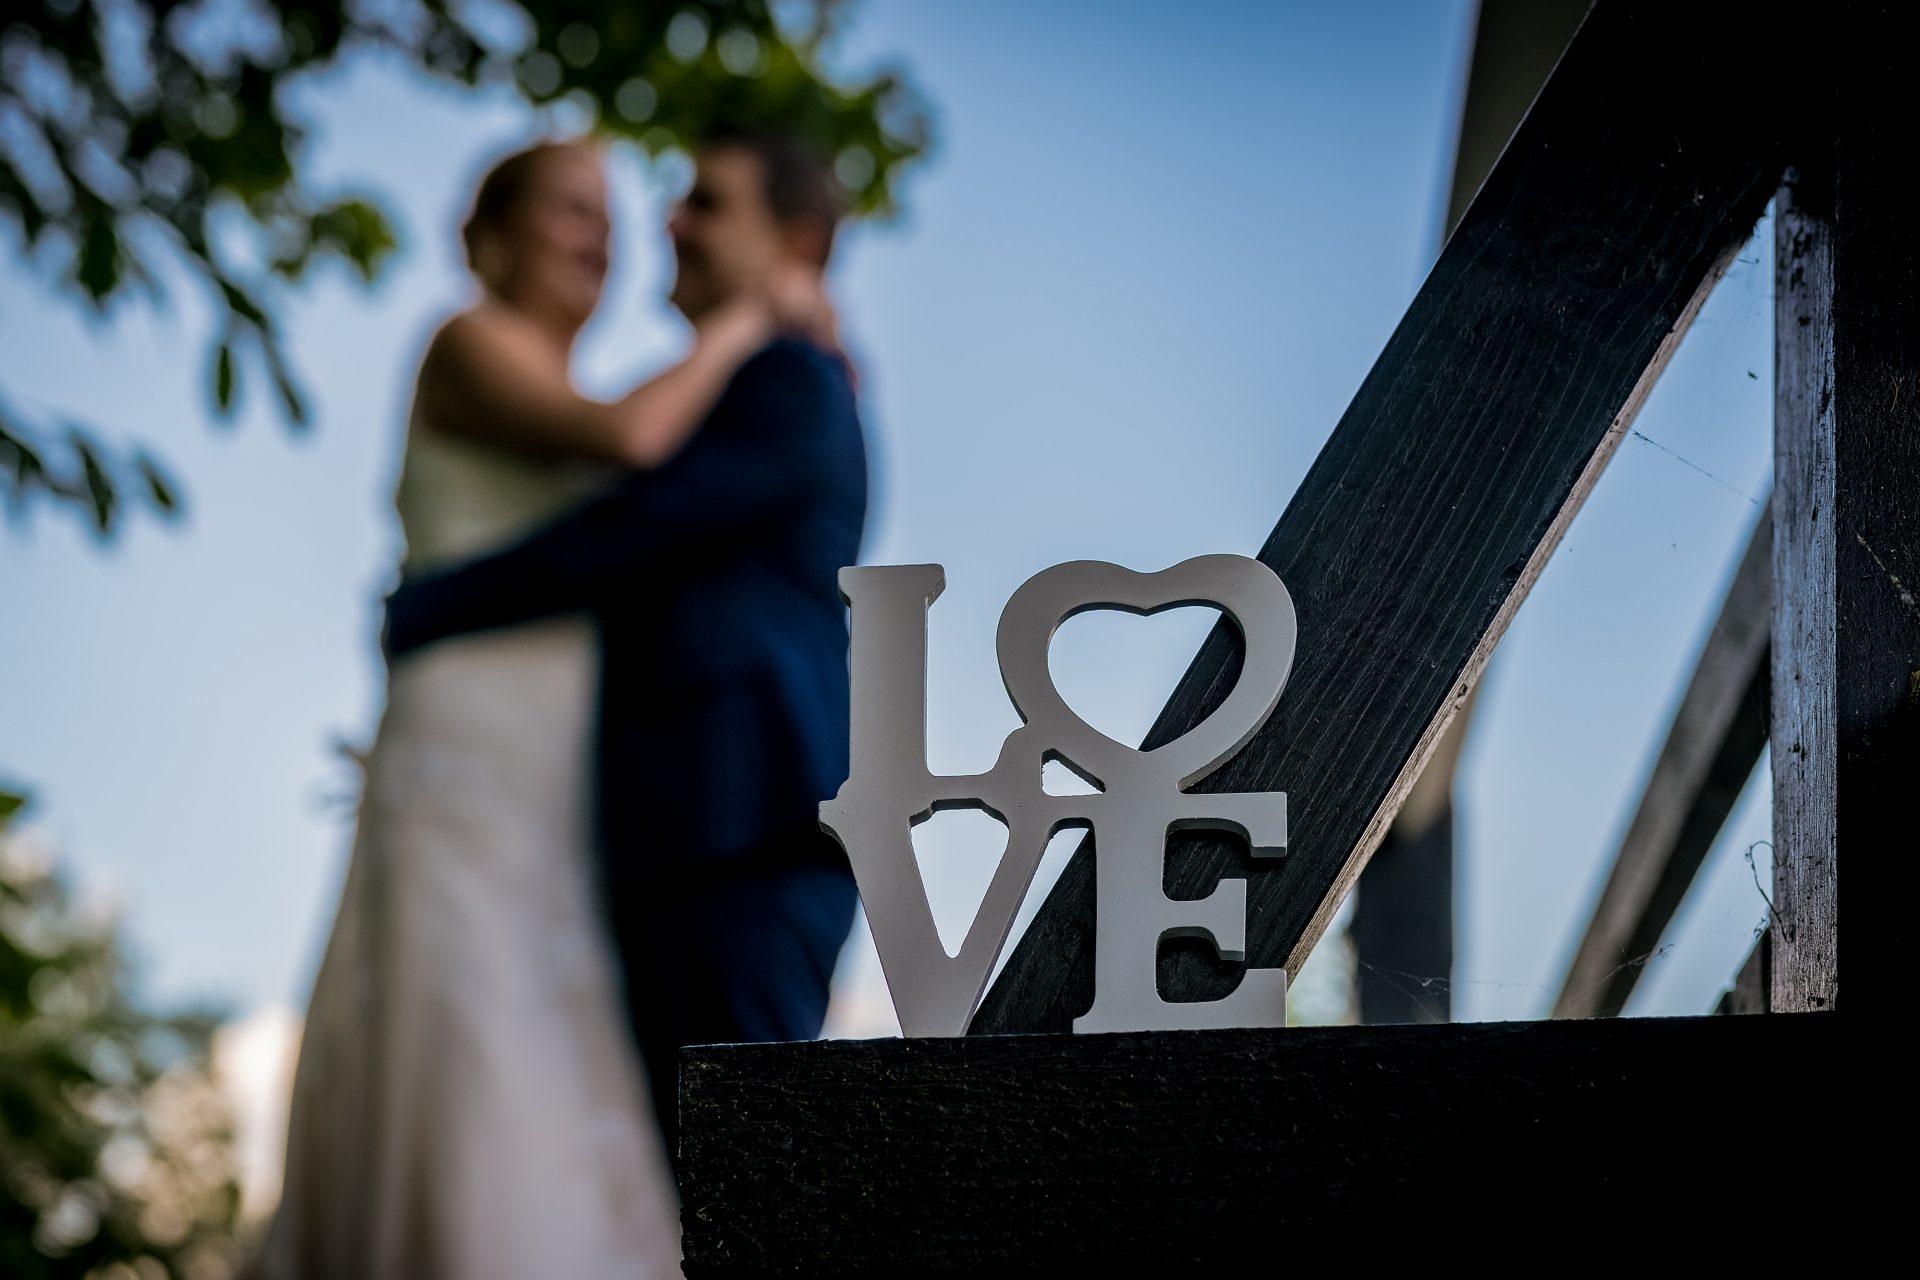 YFFUK Phil Endicott Sharpe Stoke Bruerne Northamptonshire bride groom cuddling by the lock gates love sign in forefround